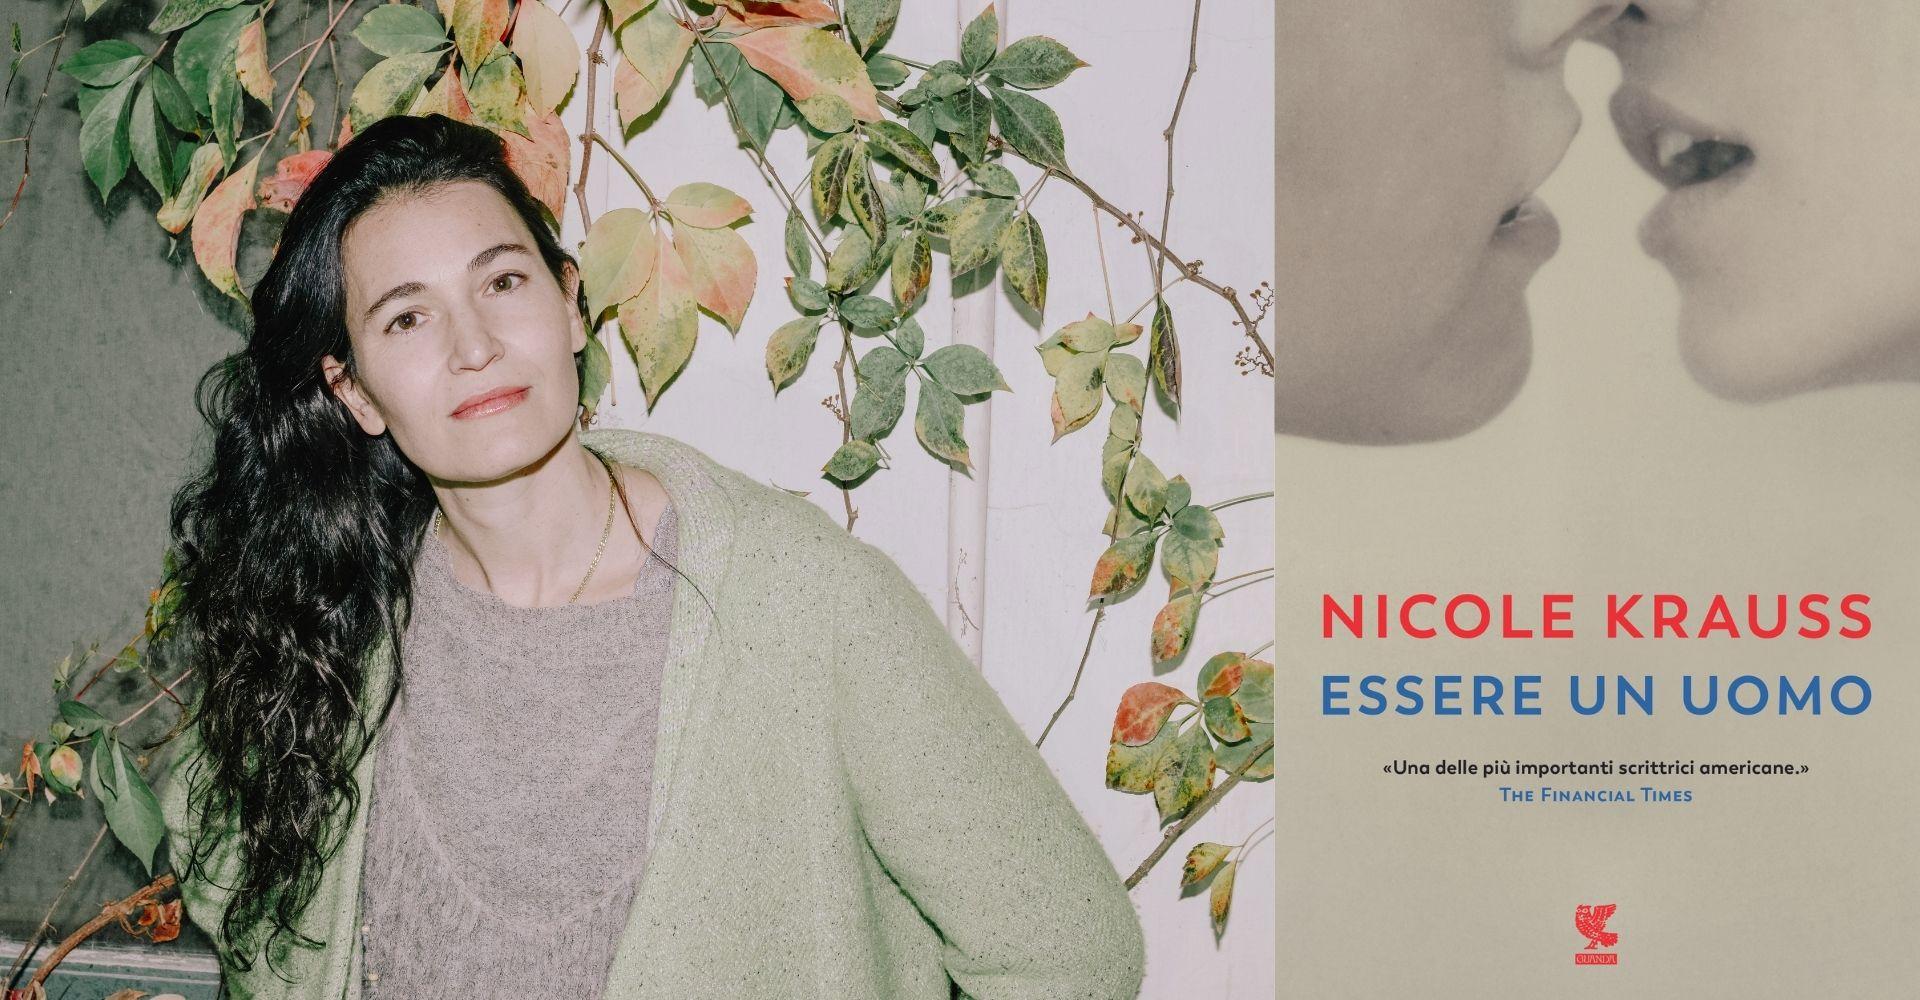 Nicole Krauss racconta cosa significa